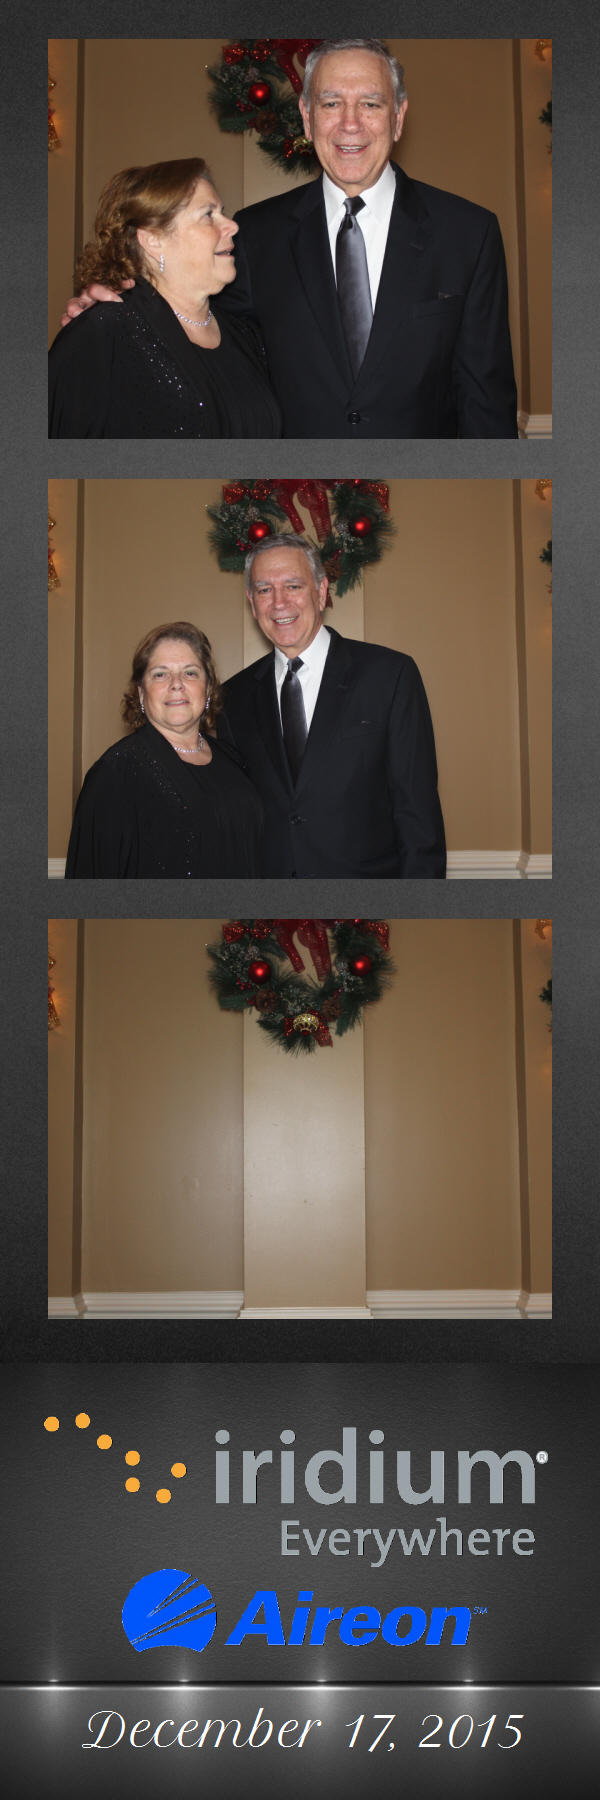 Guest House Events Photo Booth Iridium (48).jpg